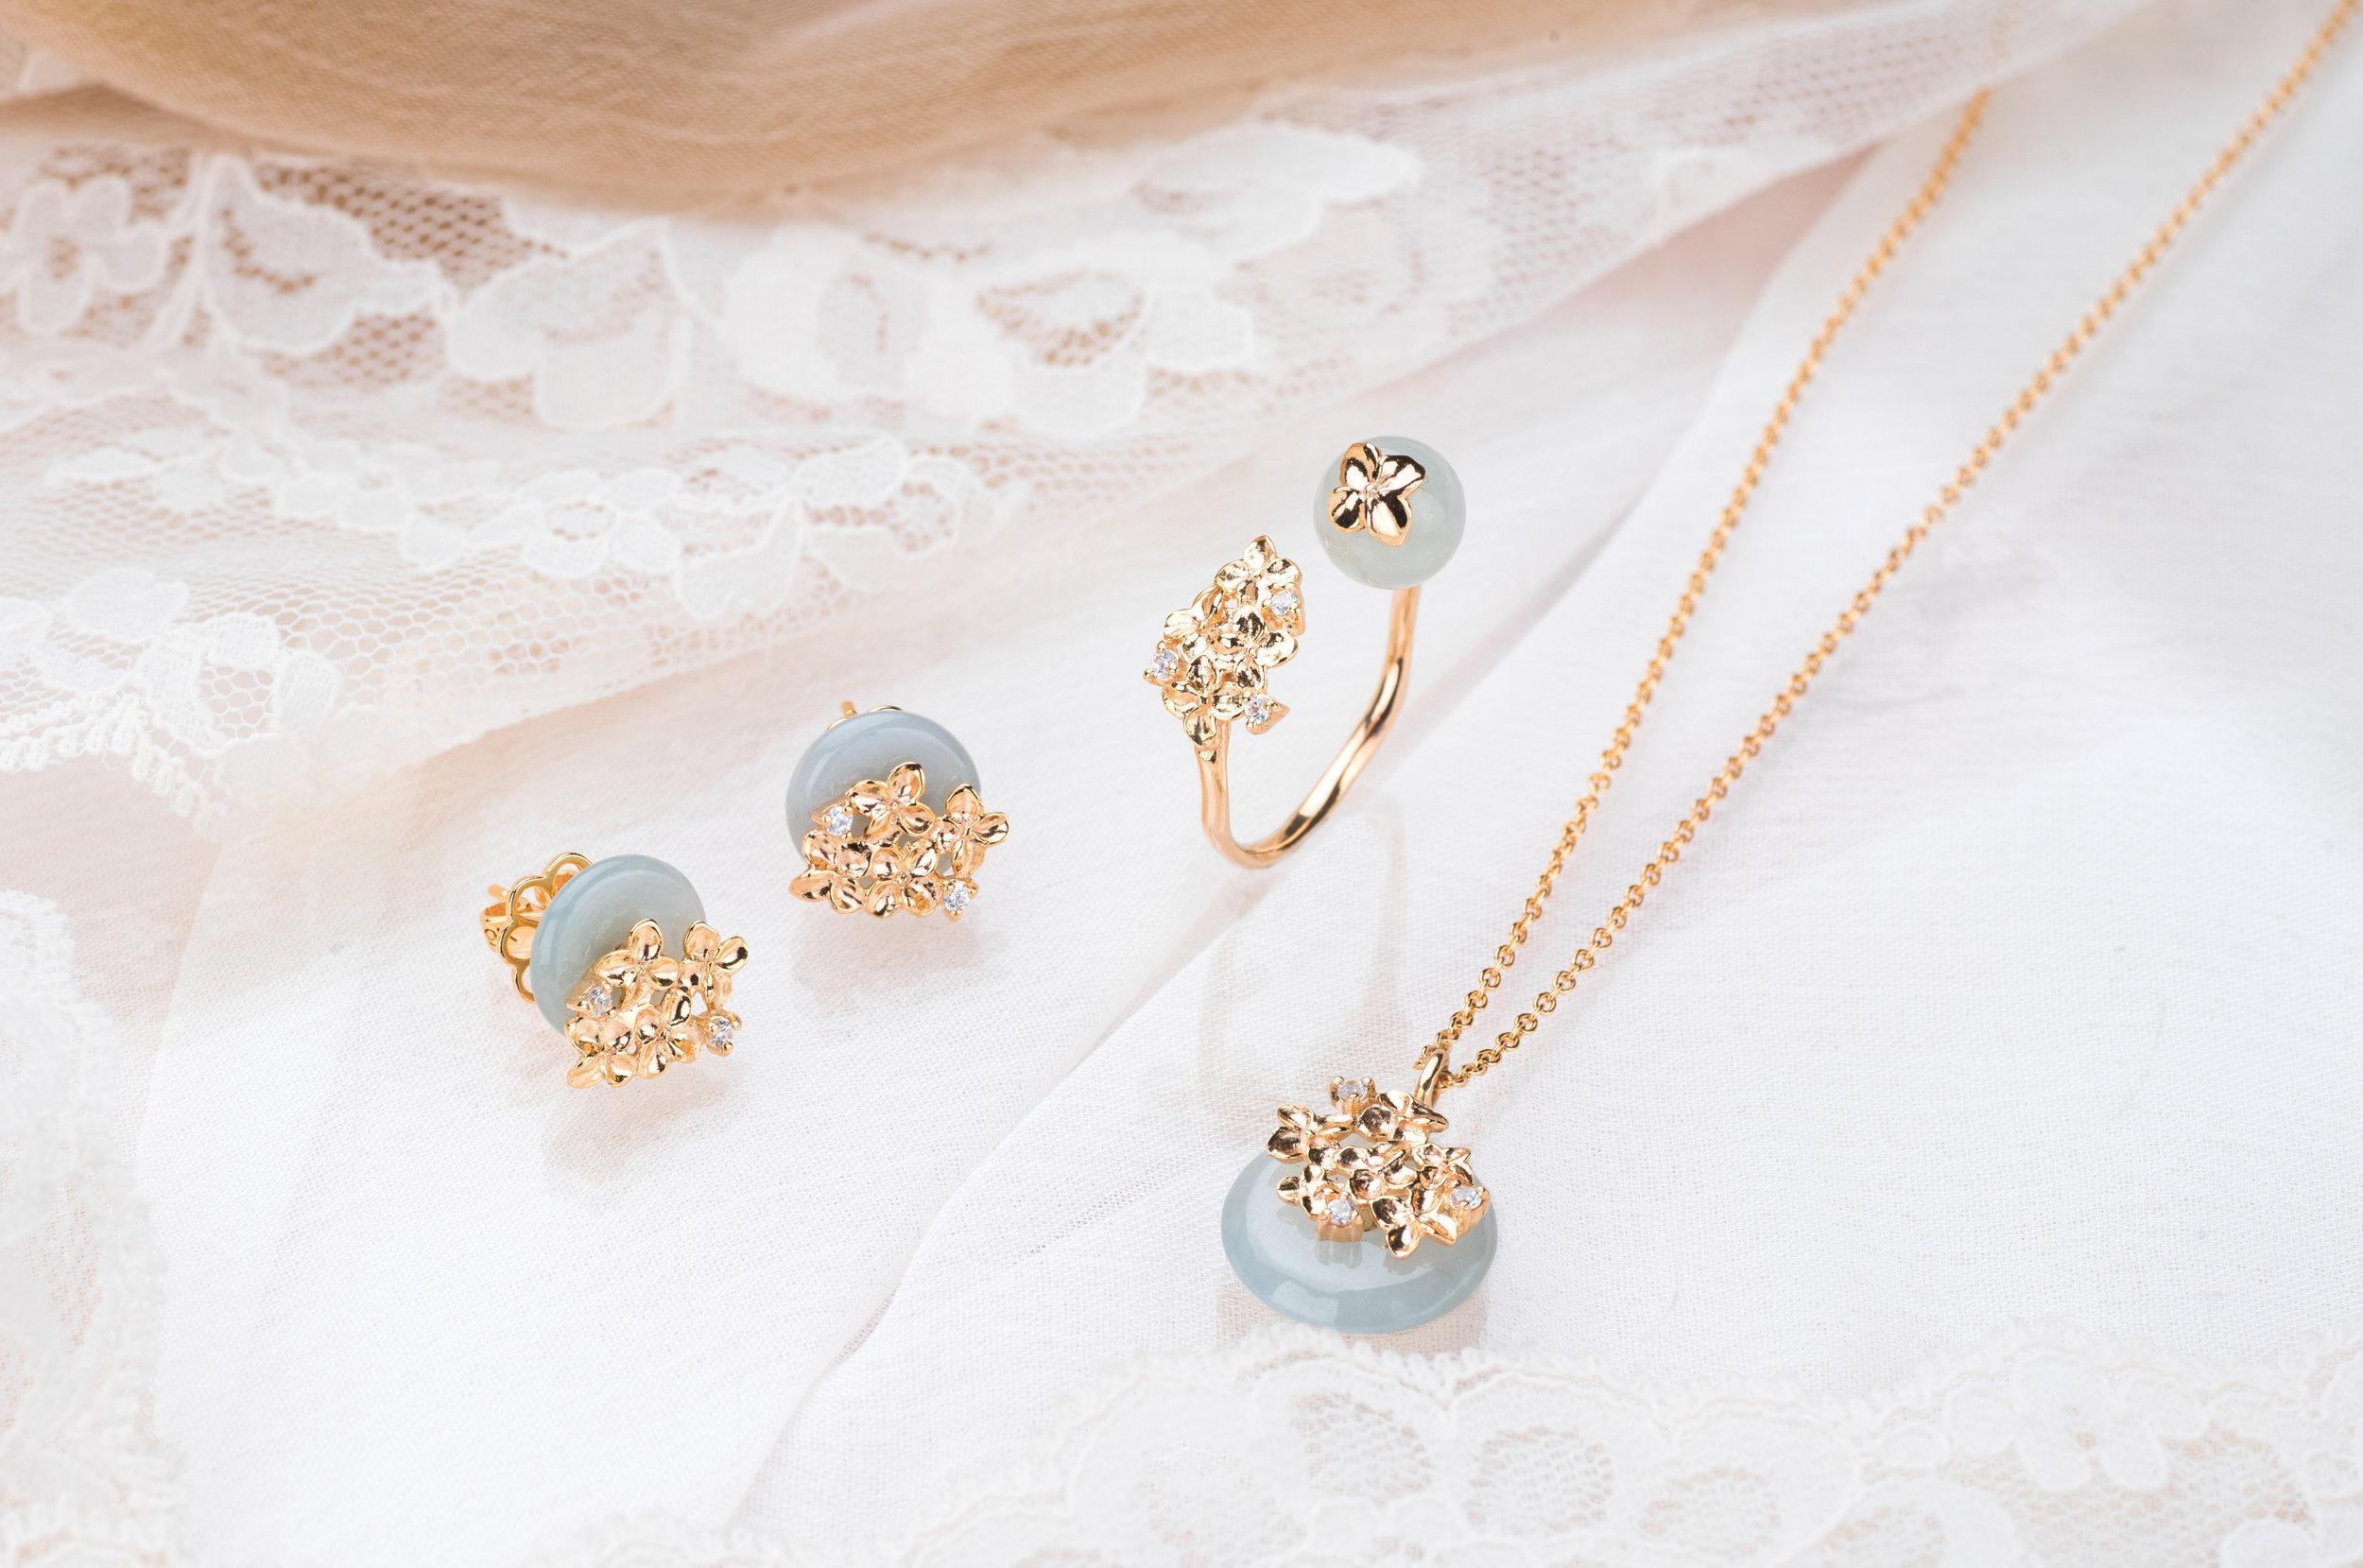 Choo Yilin Hydrangea Si Dian Jin Set in 9kt Solid Gold .